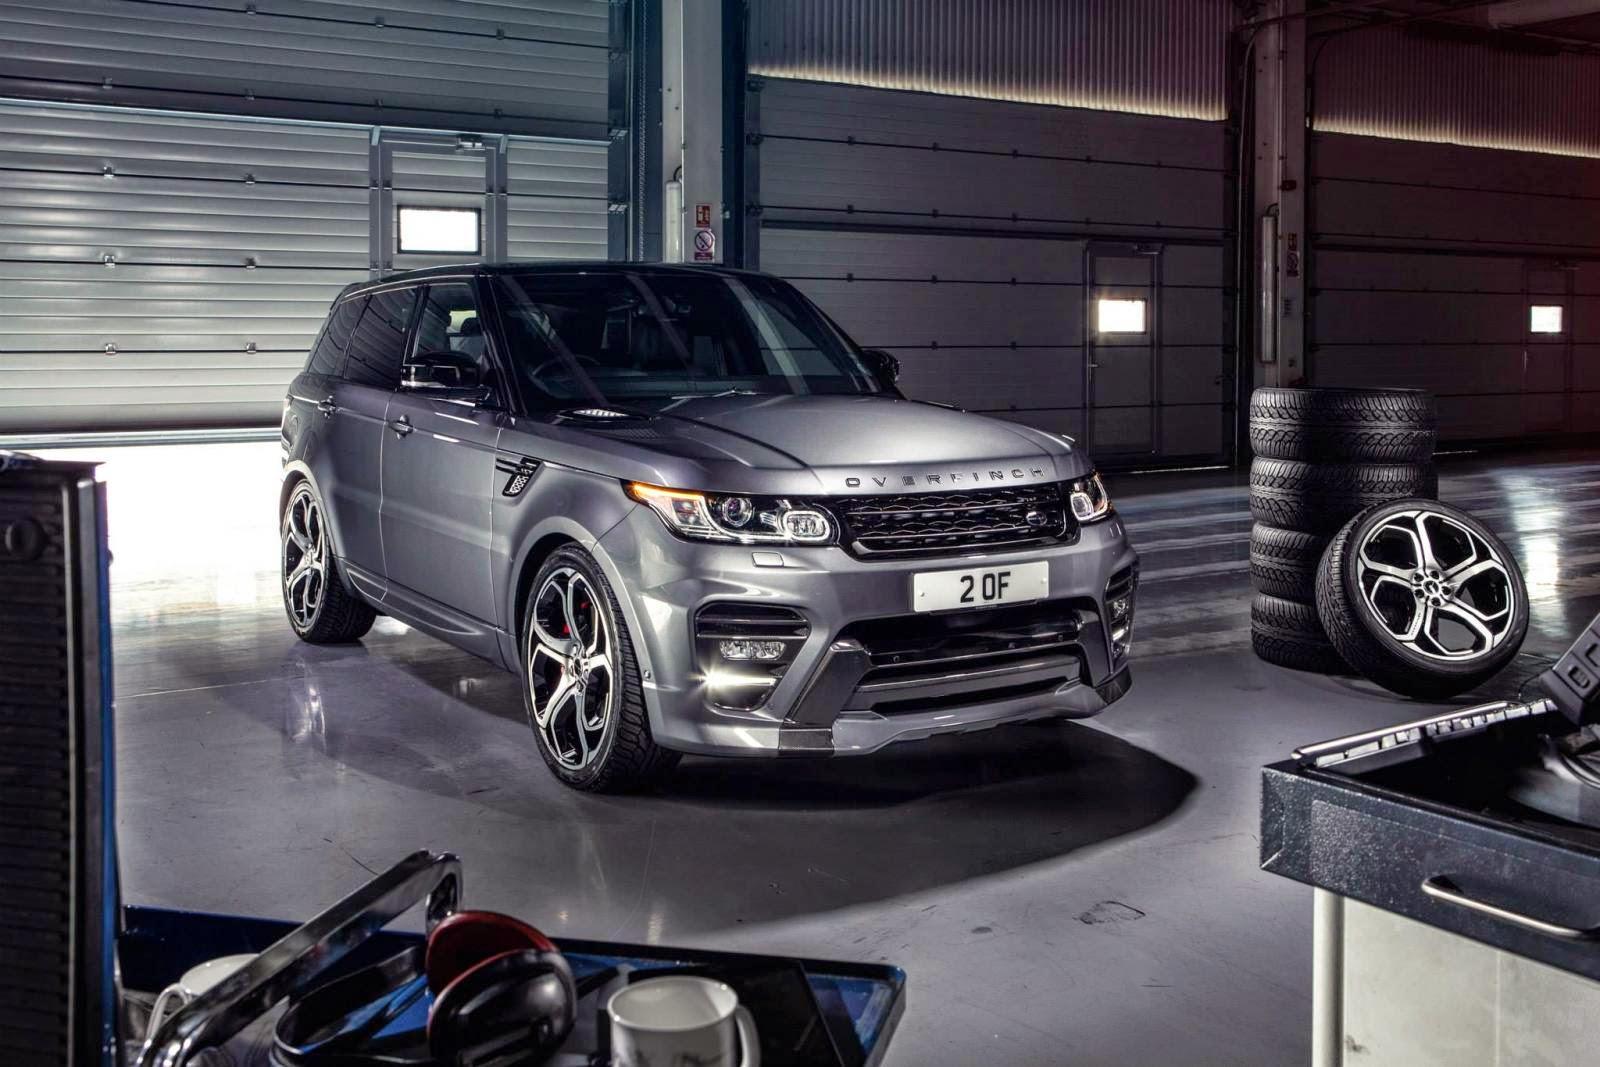 [Resim: Overfinch+Range+Rover+Sport+1.jpg]